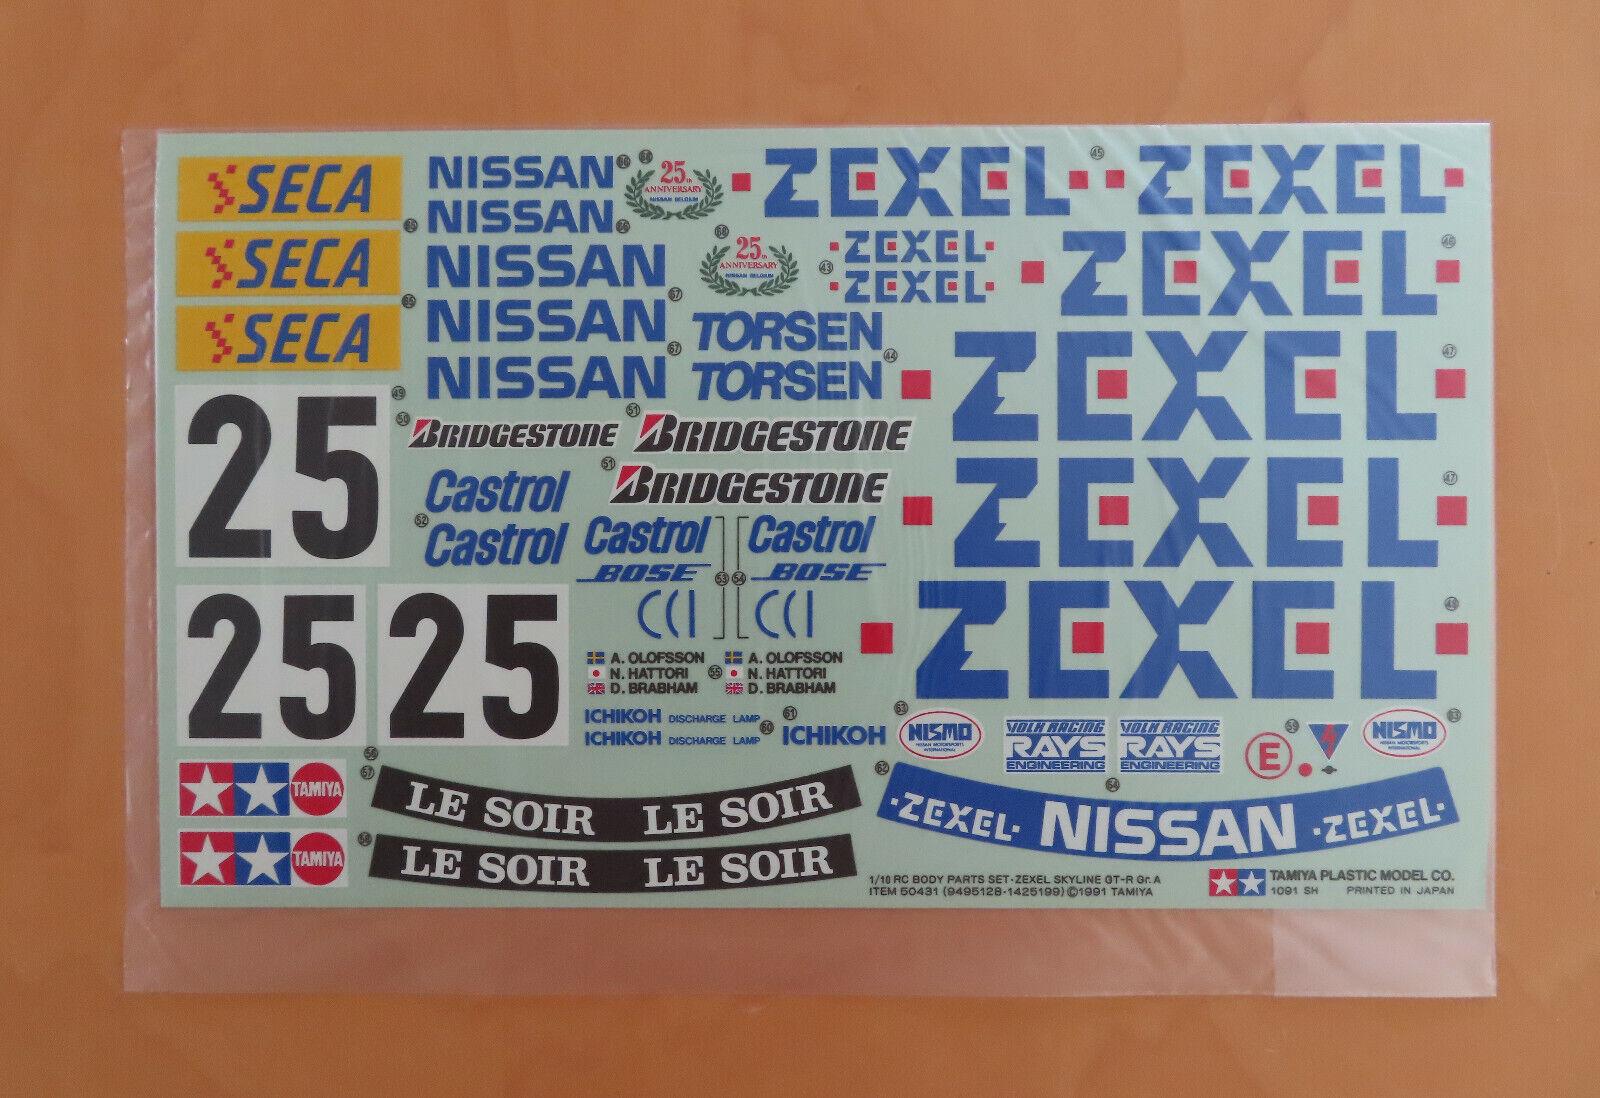 vendita online RC Tamiya DECAL NISSAN cieloLINE ZEXEL ZEXEL ZEXEL r32 MIS. a 50431 nuovo NIB 1991  marchio famoso